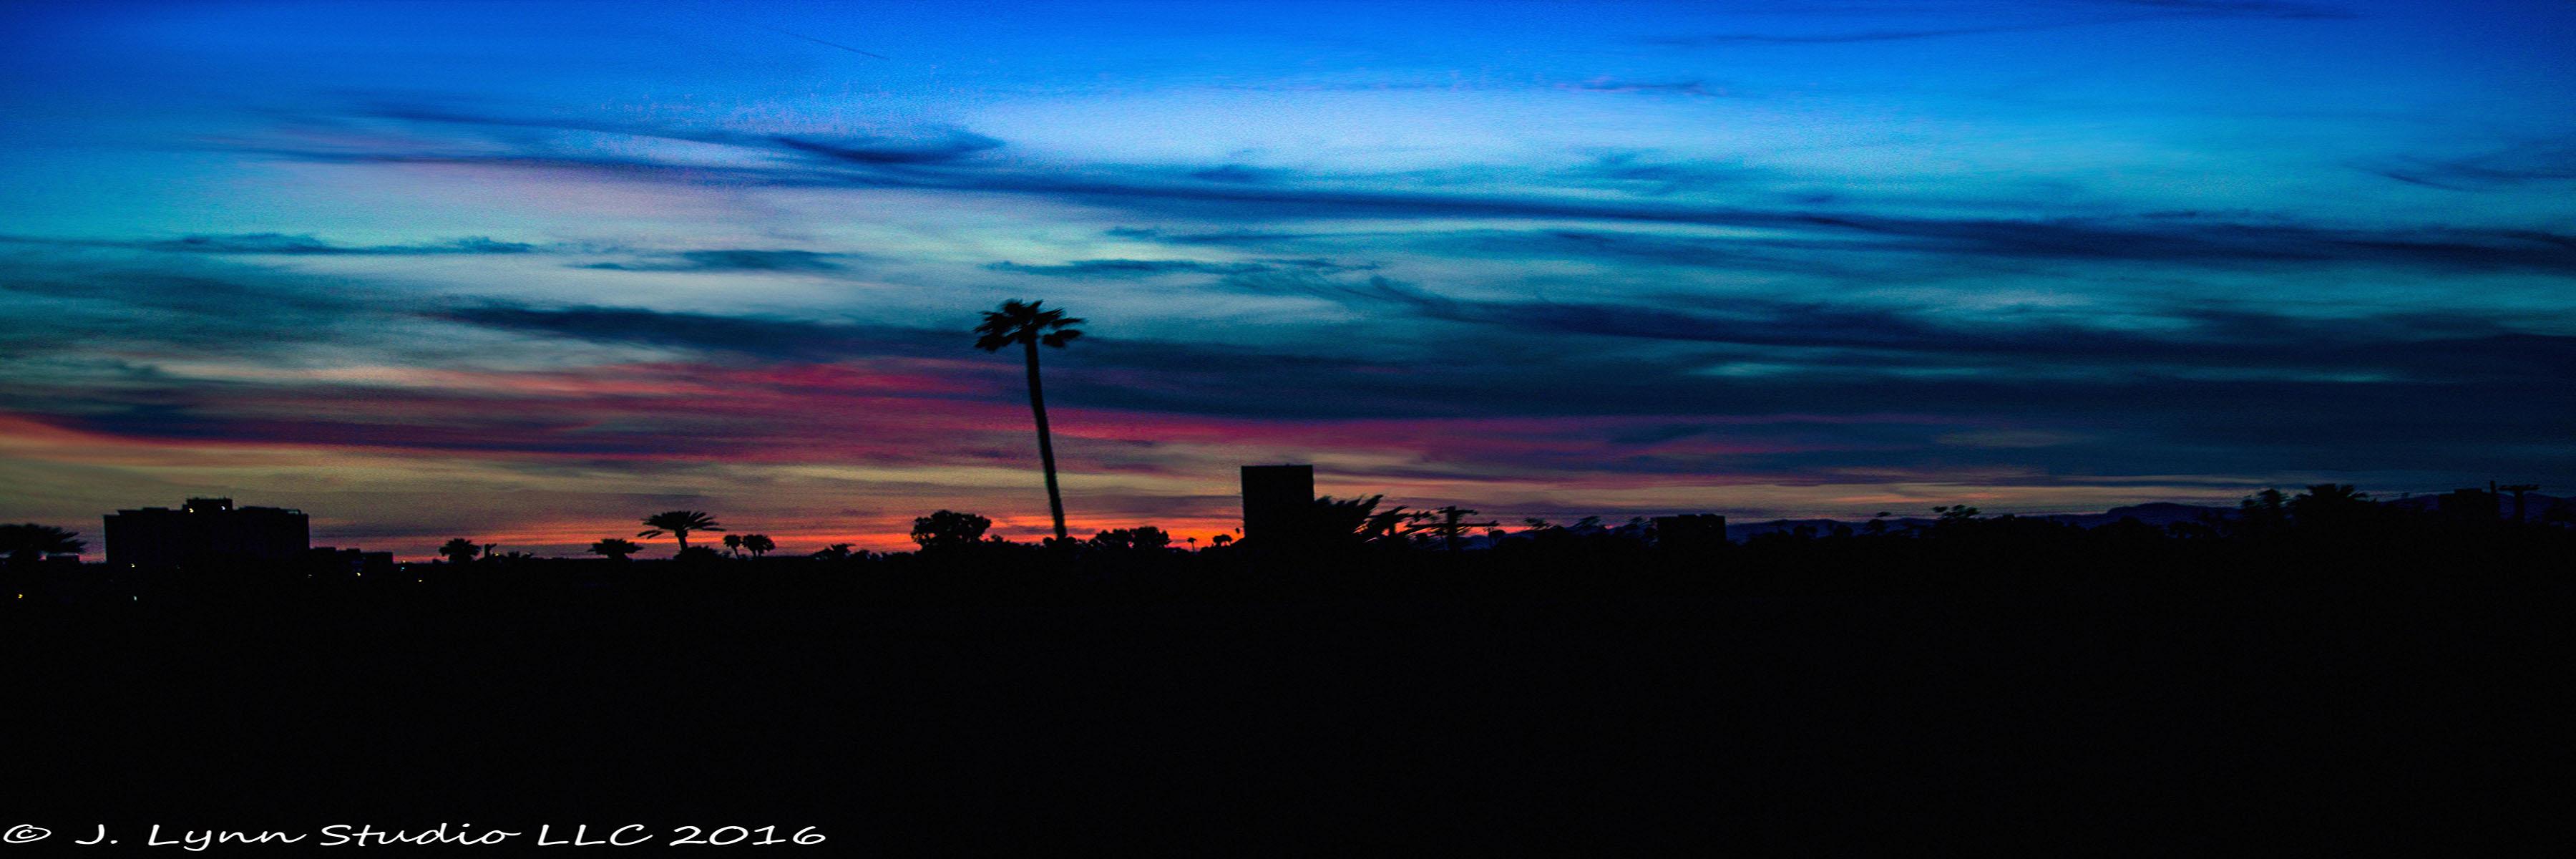 phoenix-arizona-sunset